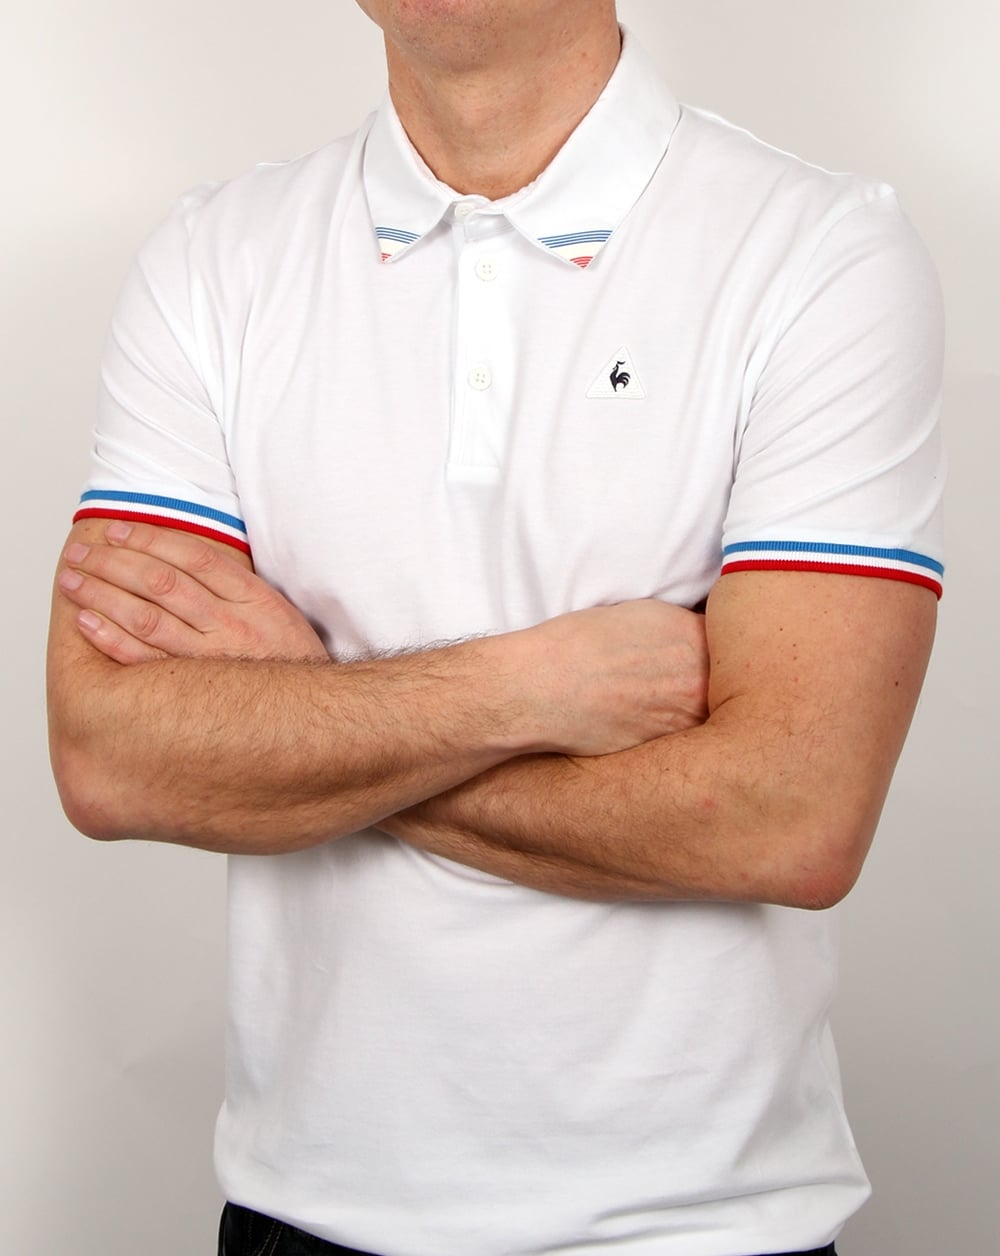 92da2af7dd Le Coq Sportif Le Coq Sportif Tricolore Tipped Polo Shirt White